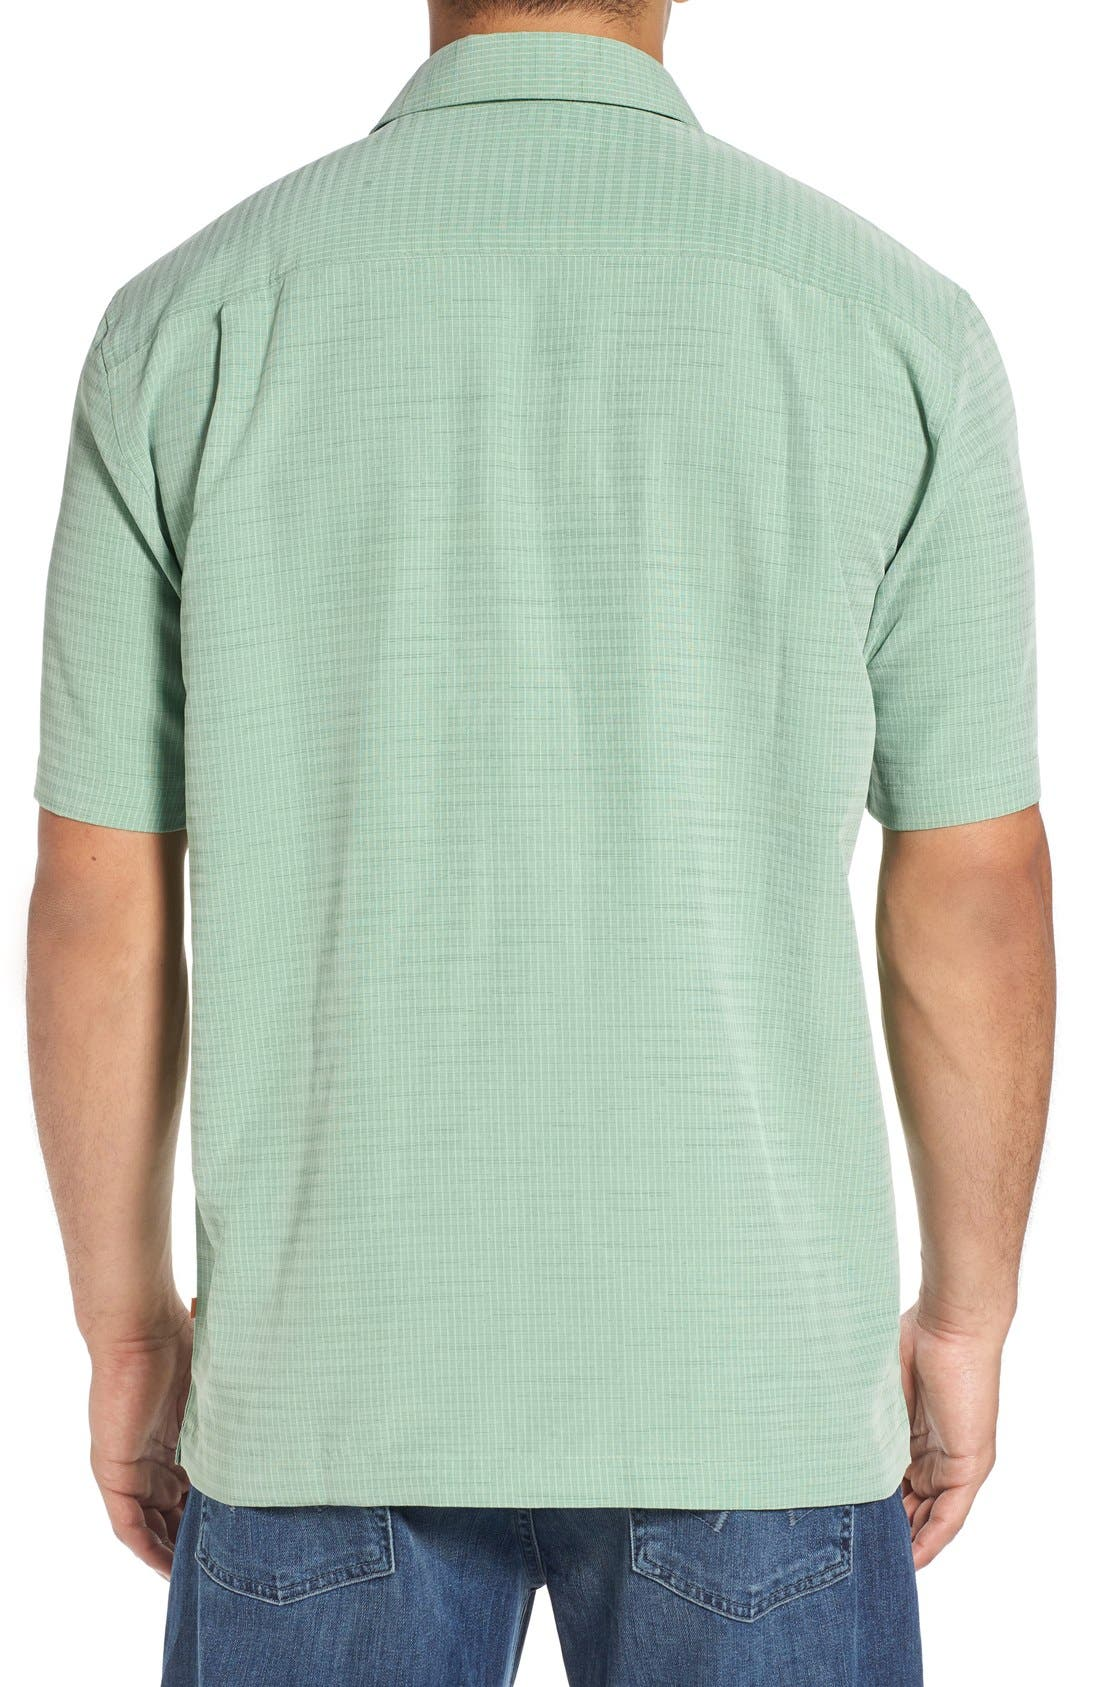 'Centinela 4' Short Sleeve Sport Shirt,                             Alternate thumbnail 30, color,